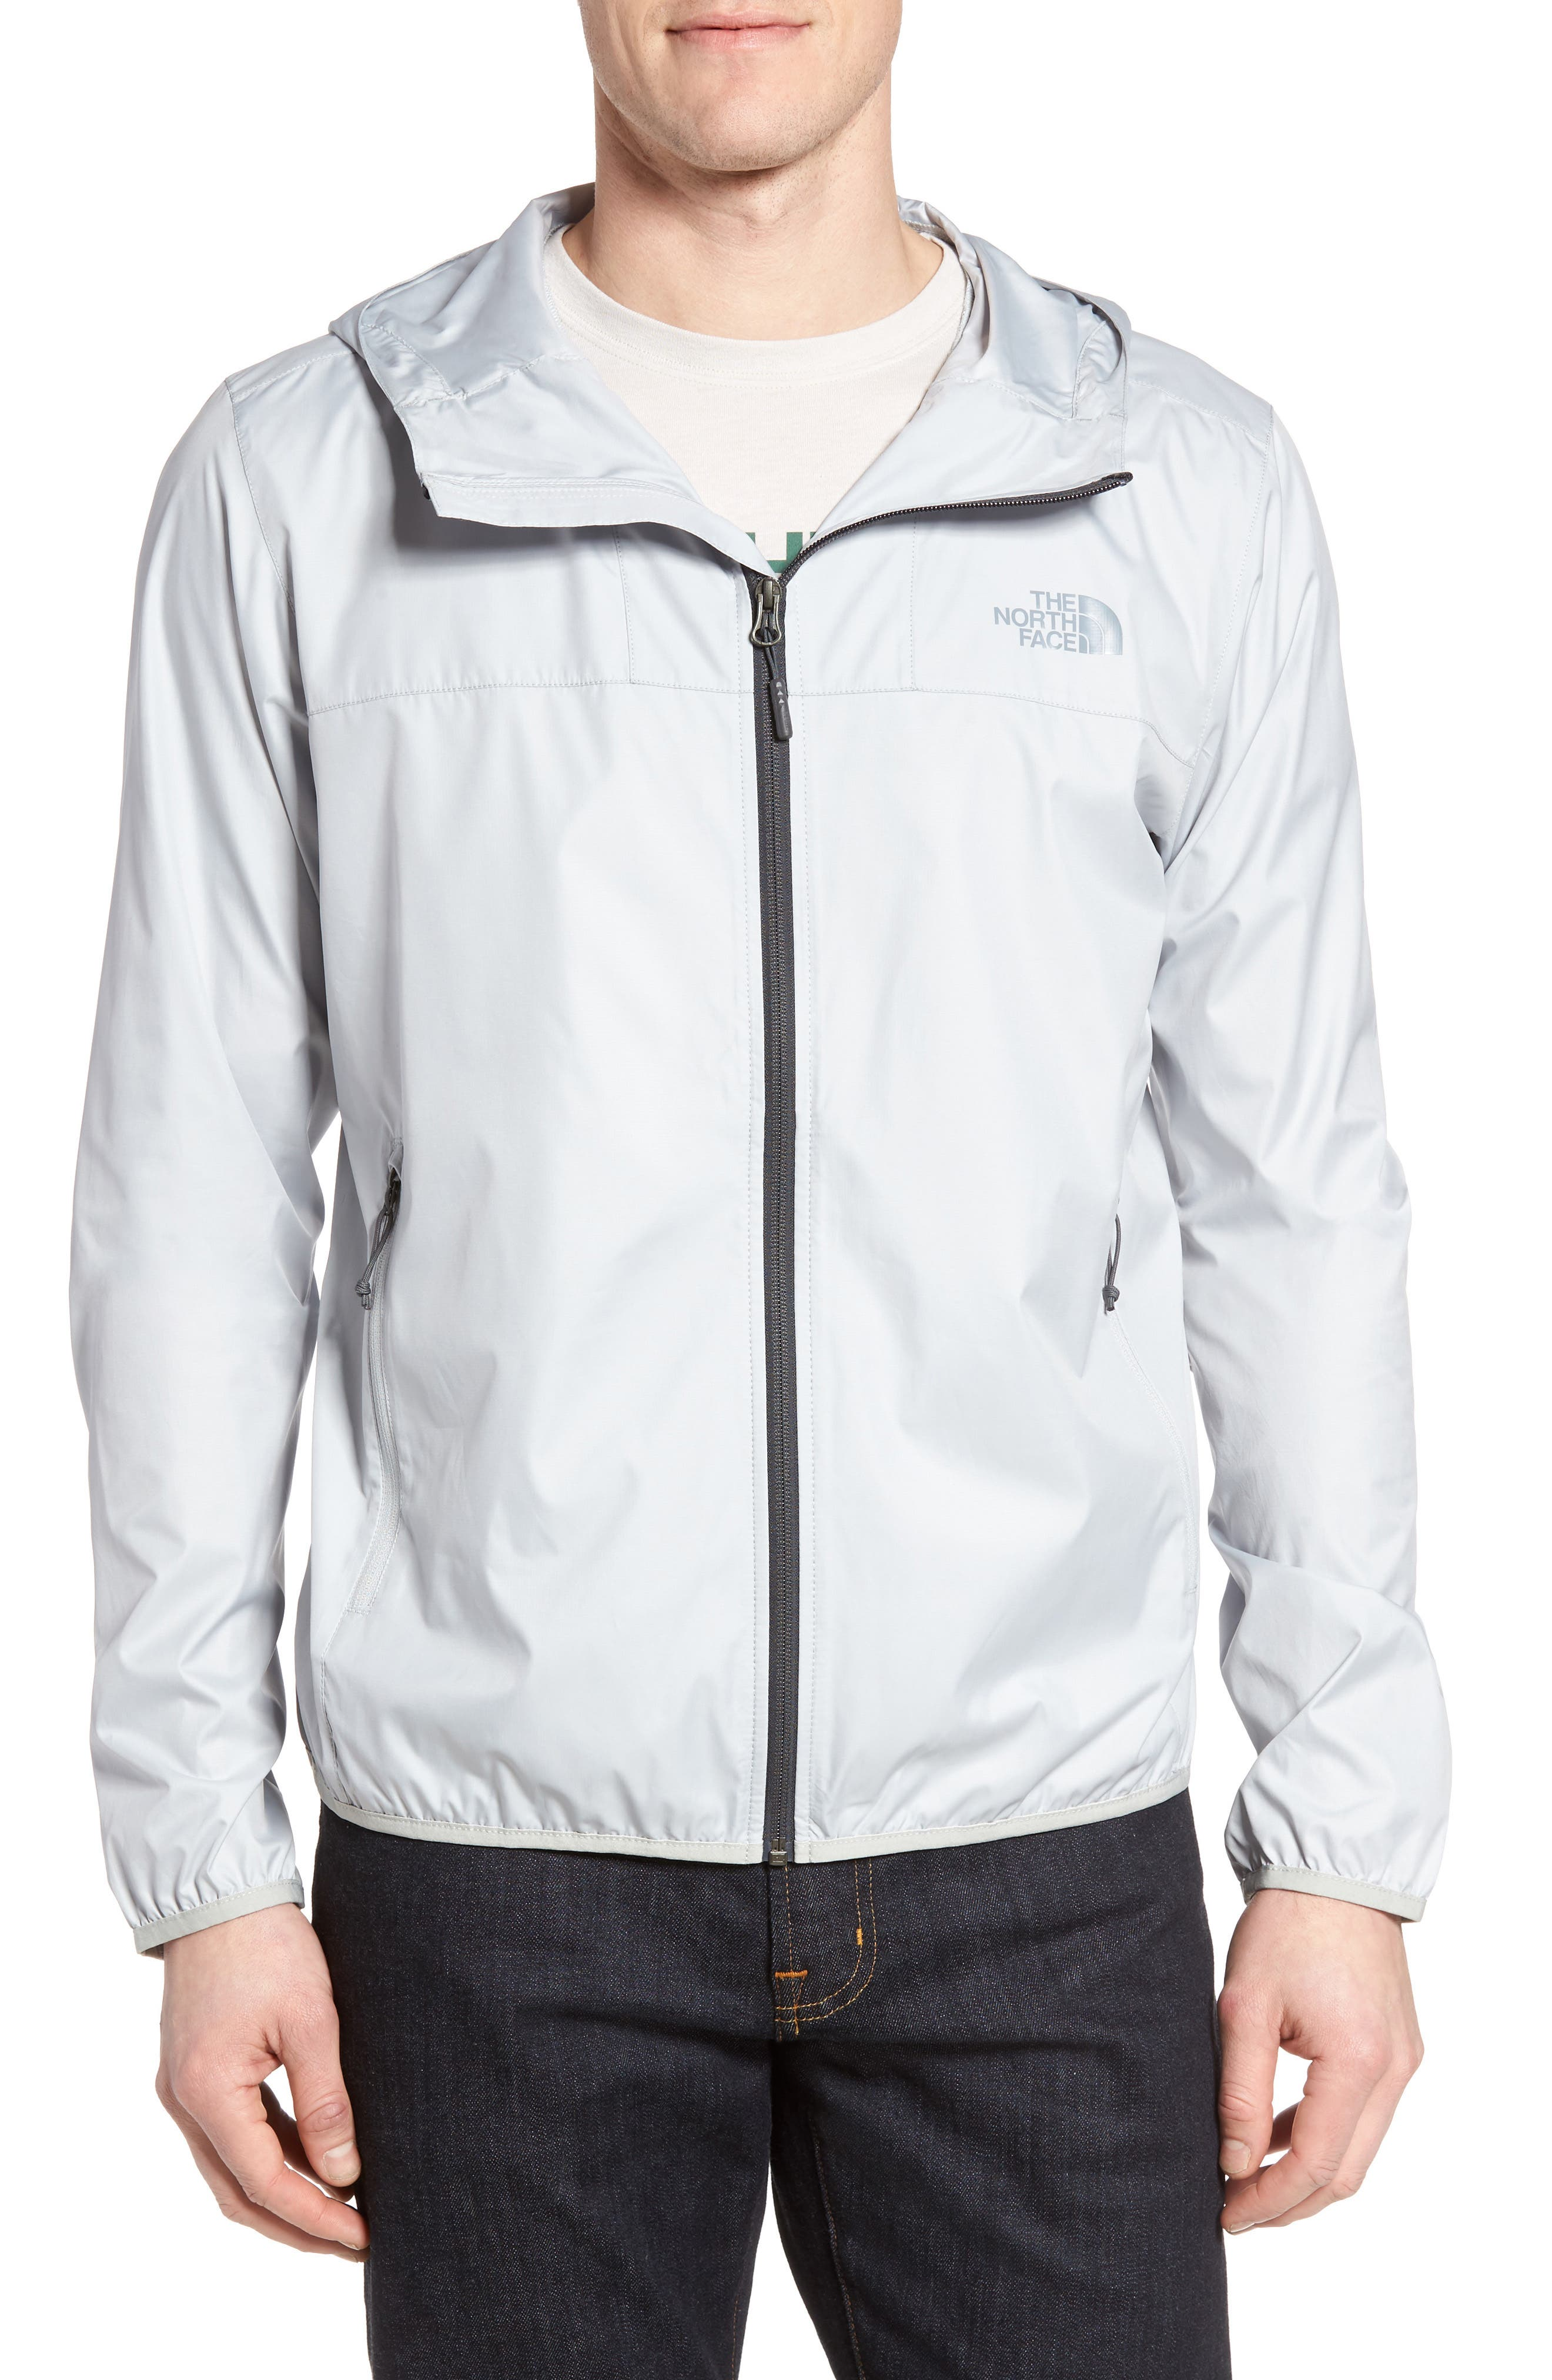 Cyclone 2 WindWall<sup>®</sup> Raincoat,                         Main,                         color, High Rise Grey/ High Rise Grey